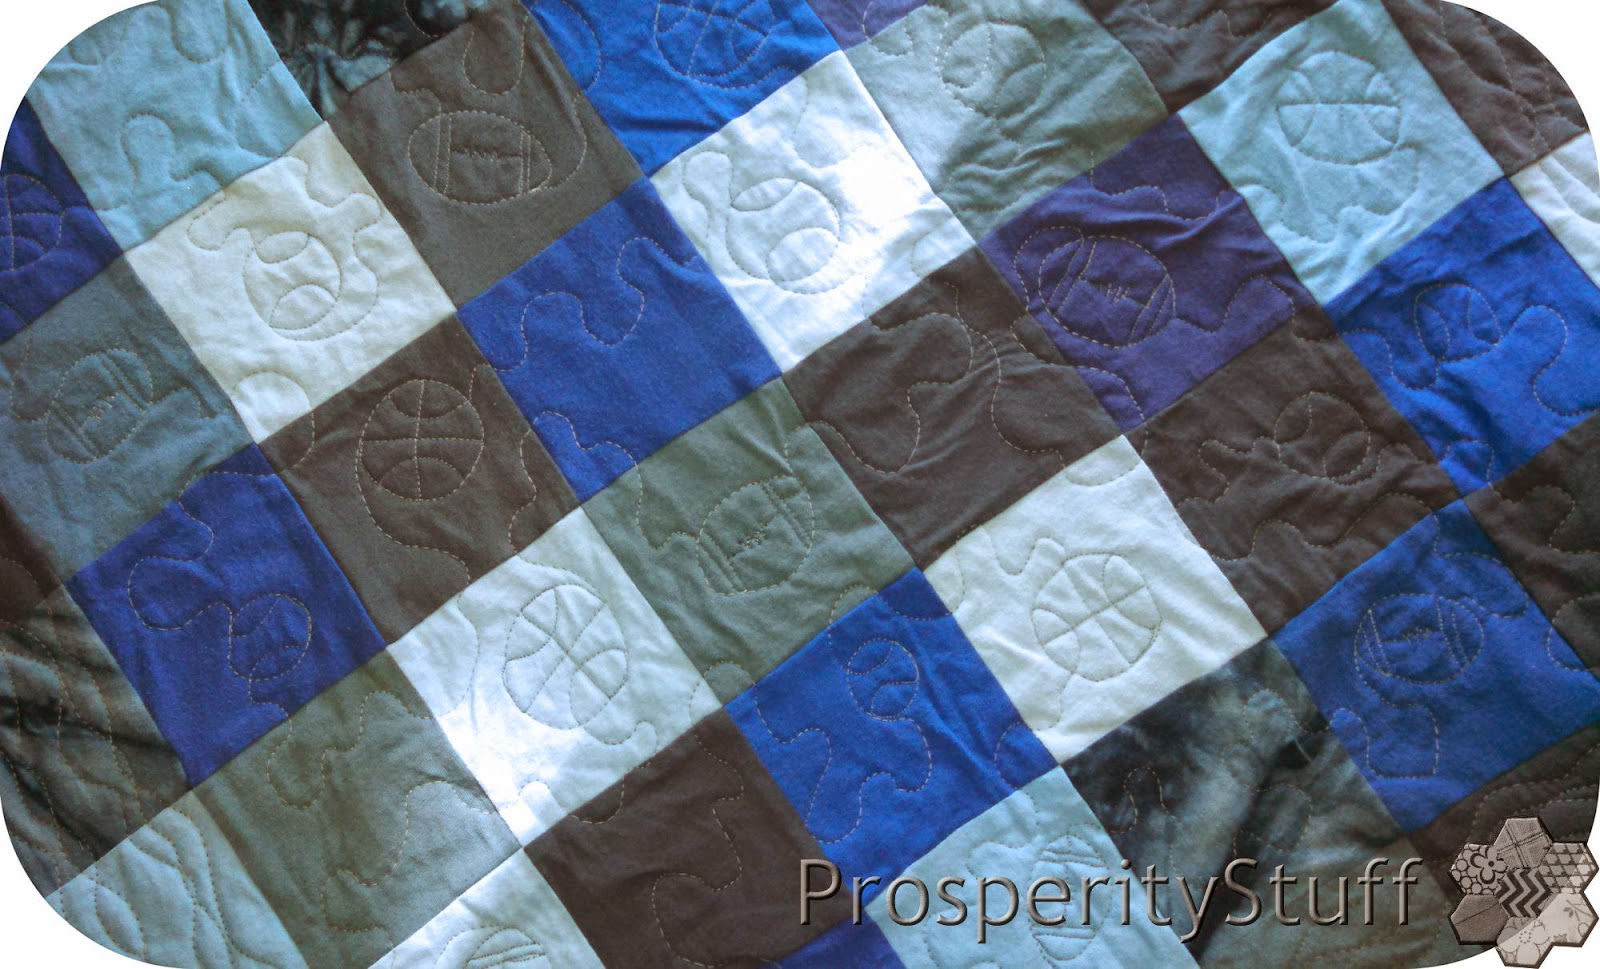 ProsperityStuff Quilts: Free-motion quilting football, baseball, basketball